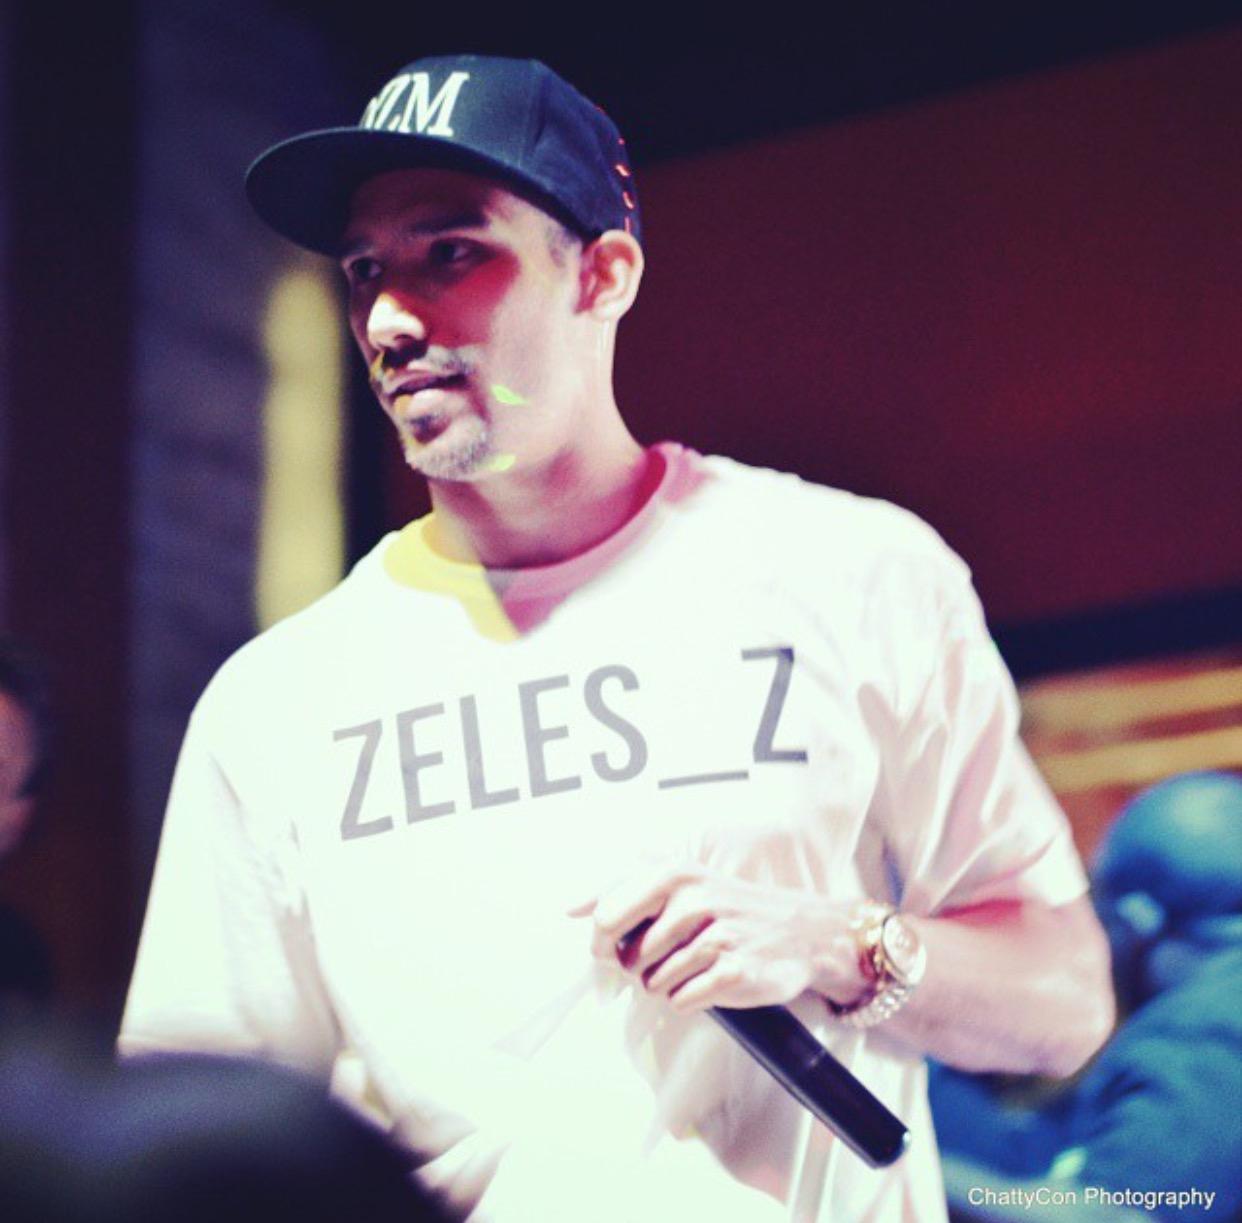 Zeles_Z Yung LA mic.jpg